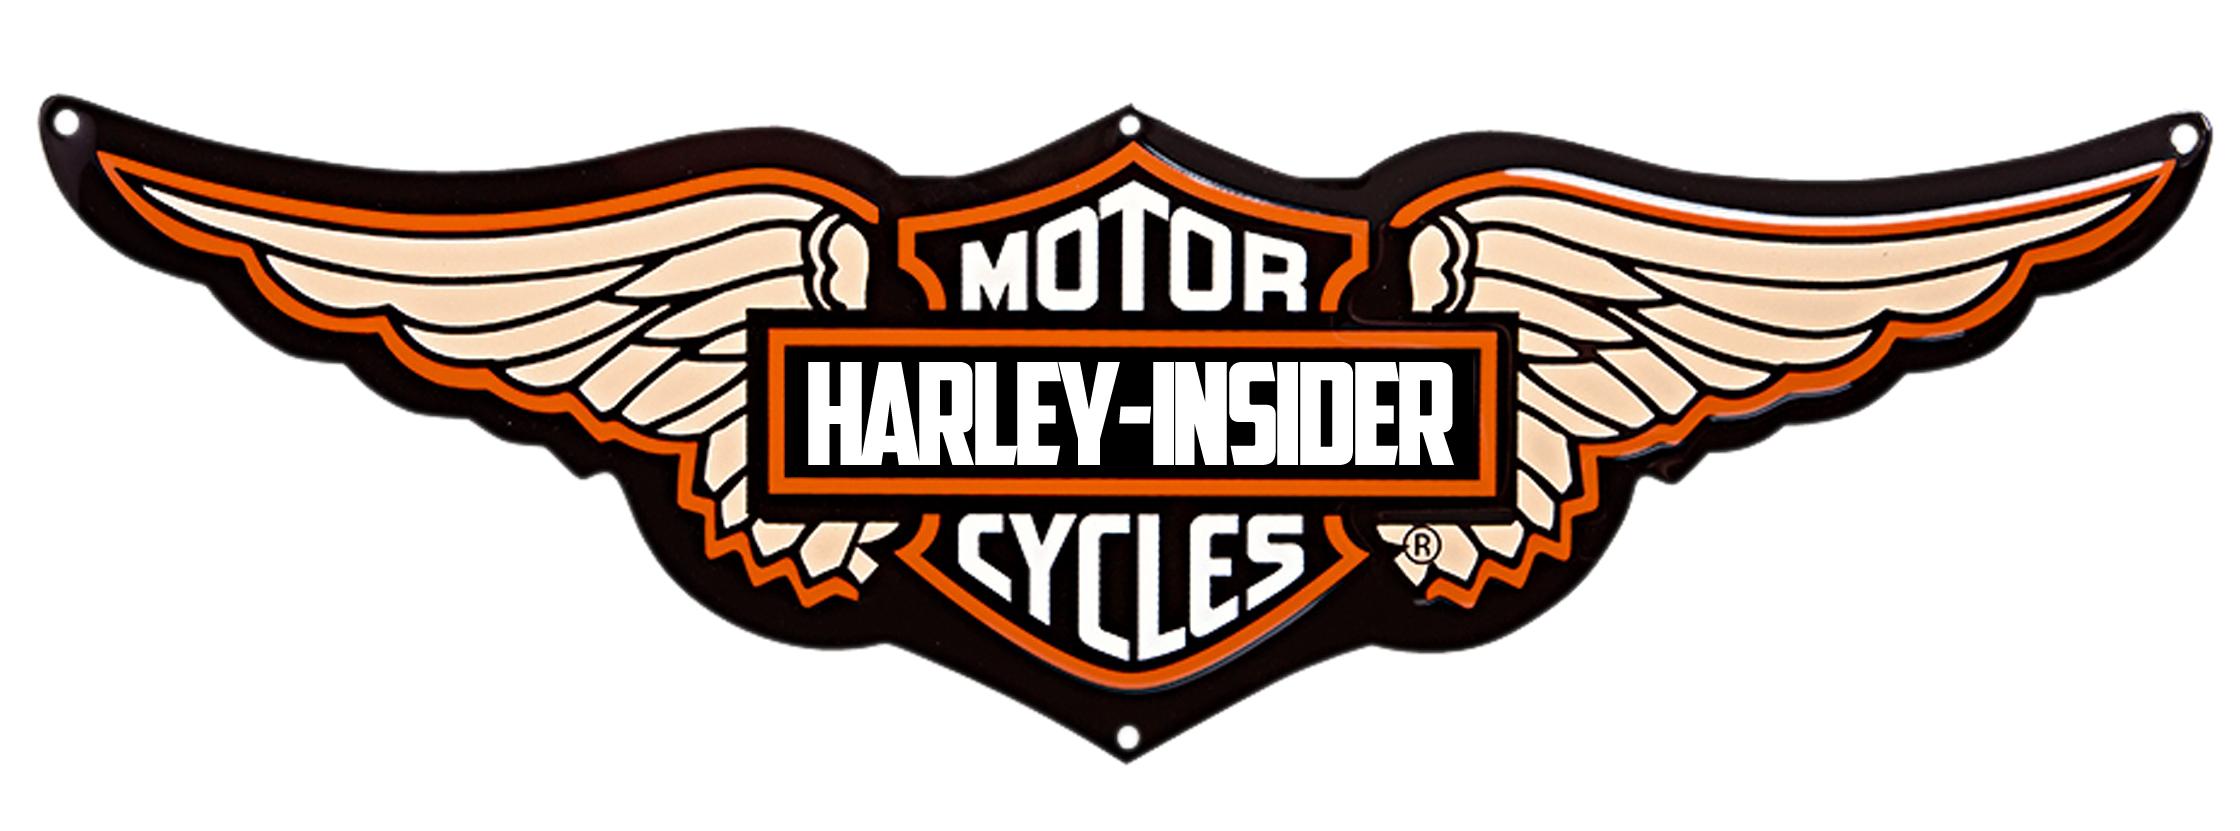 clip art royalty free stock Logo download free clip. Harley davidson clipart.